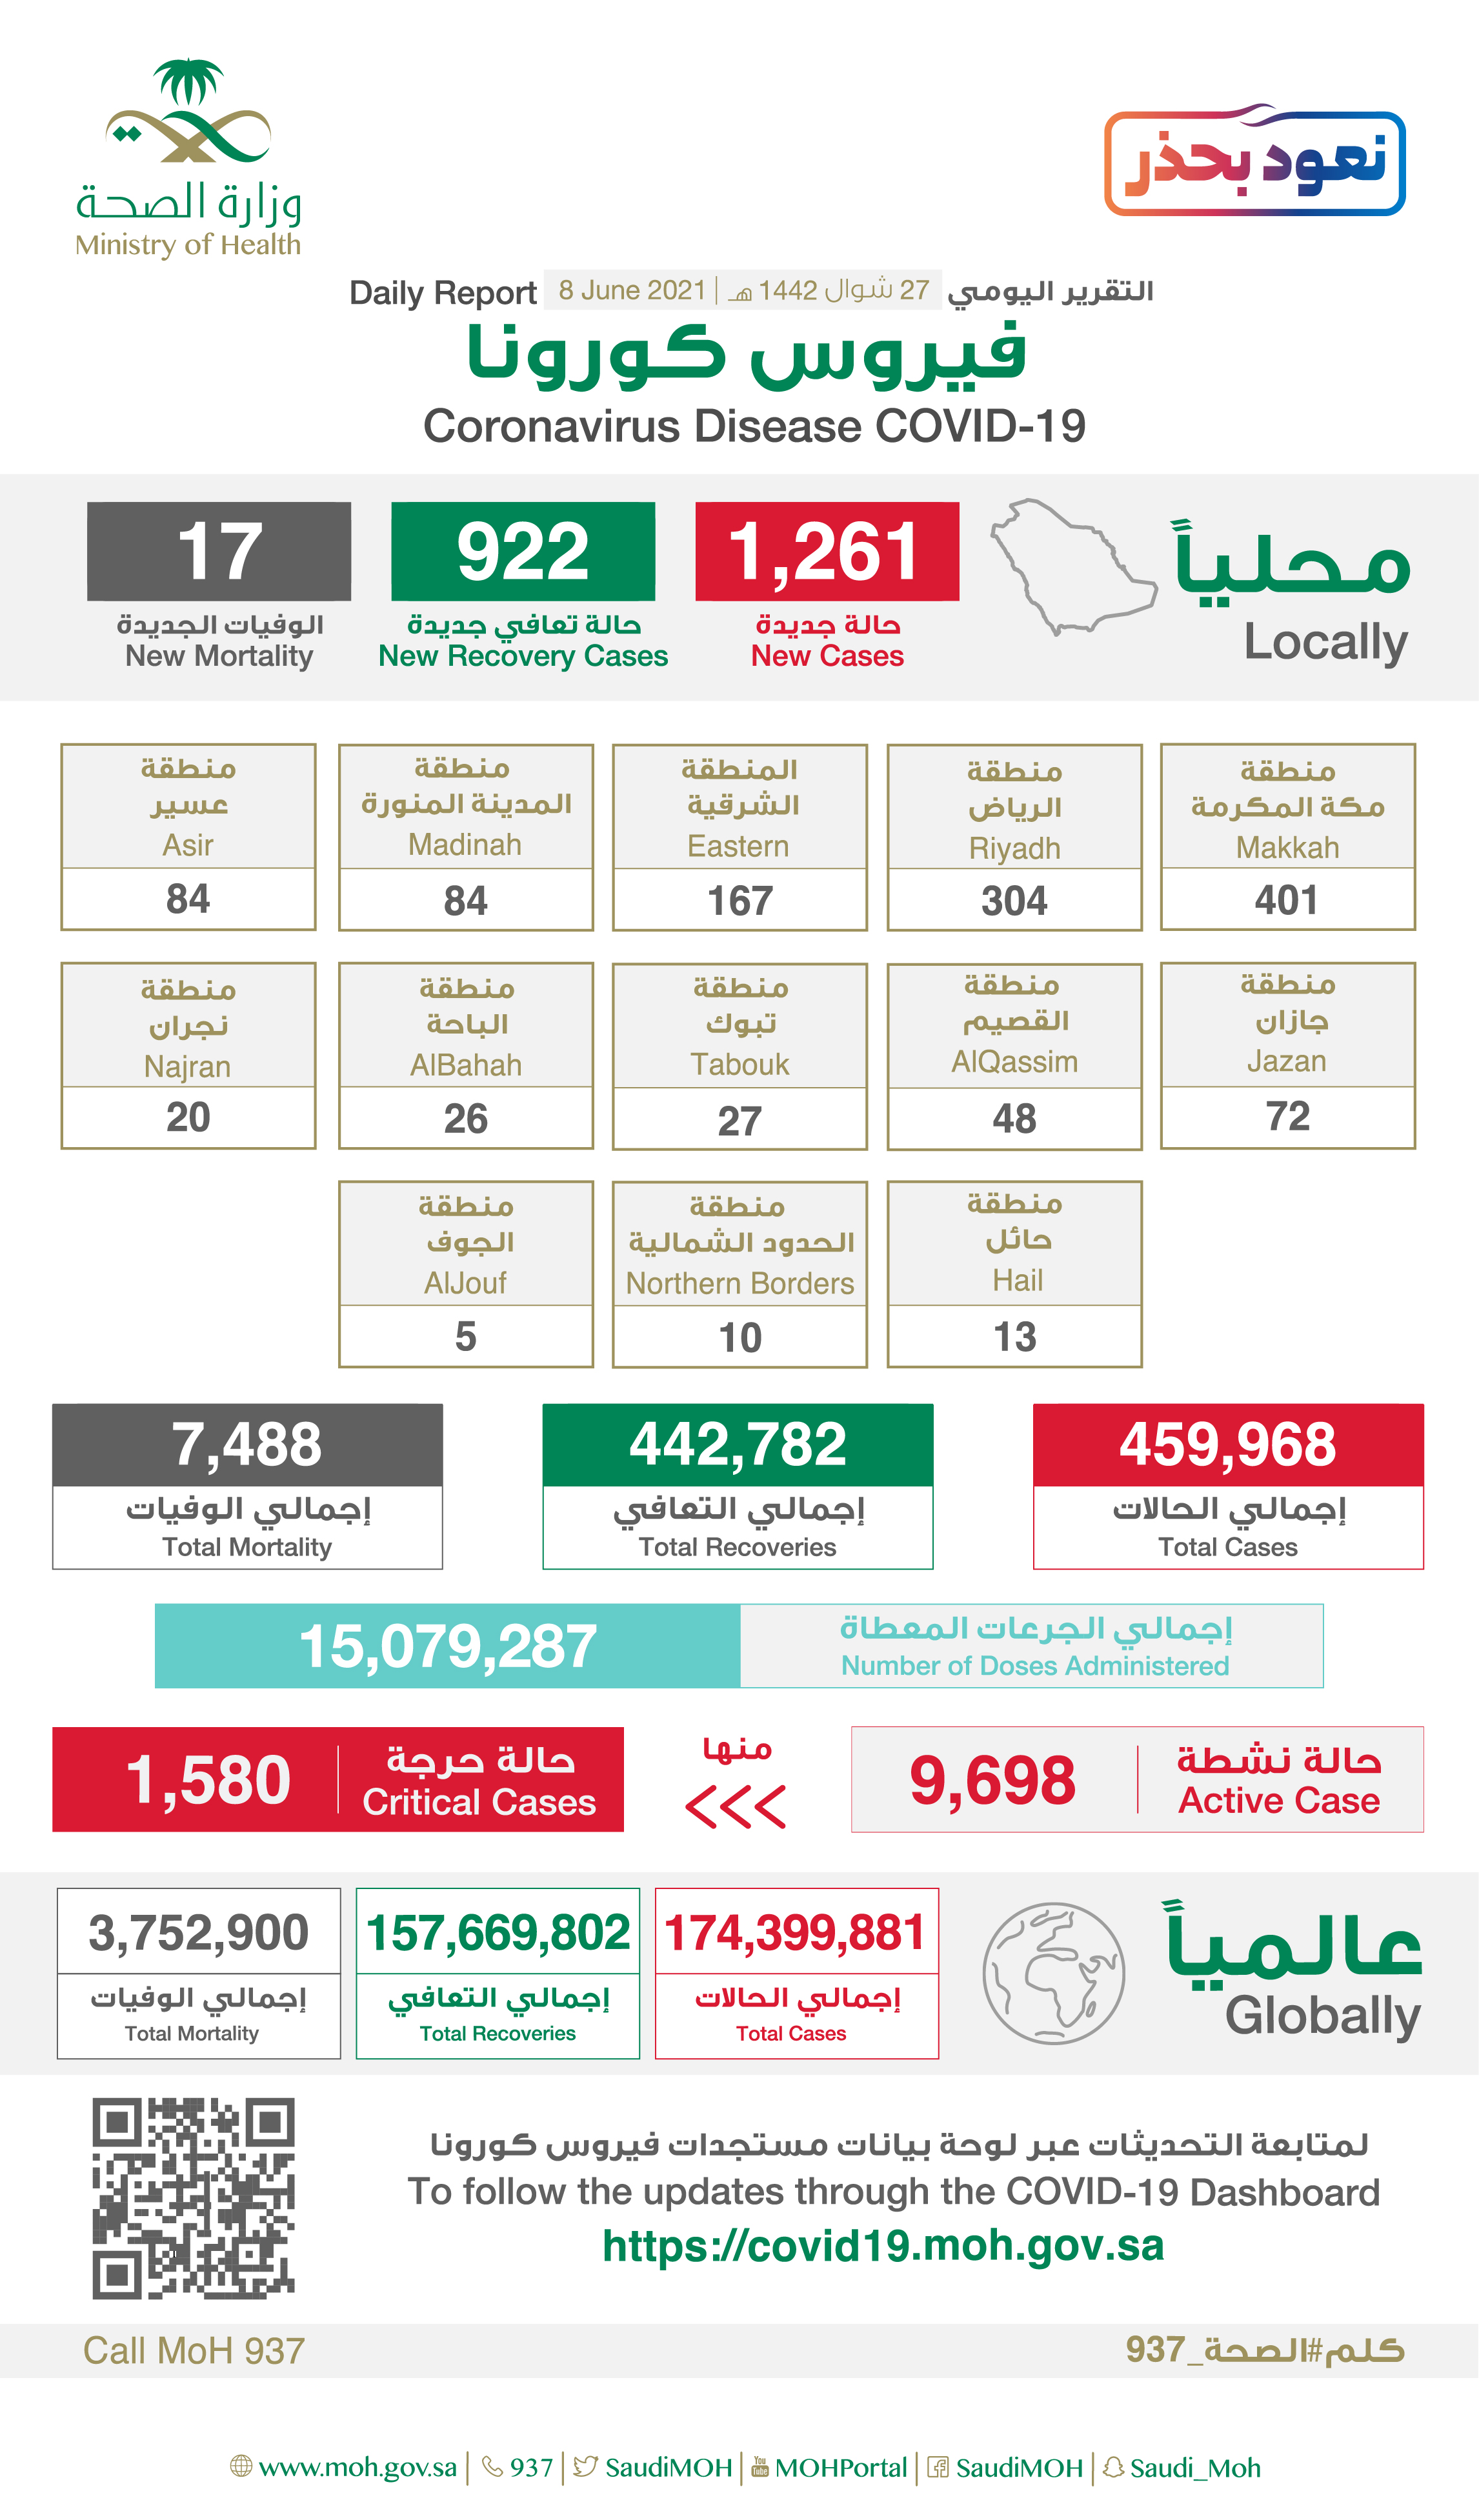 Saudi Arabia Coronavirus : Total Cases :459,968 , New Cases : 1,261 , Cured : 442,782 , Deaths: 7,488, Active Cases : 9,698